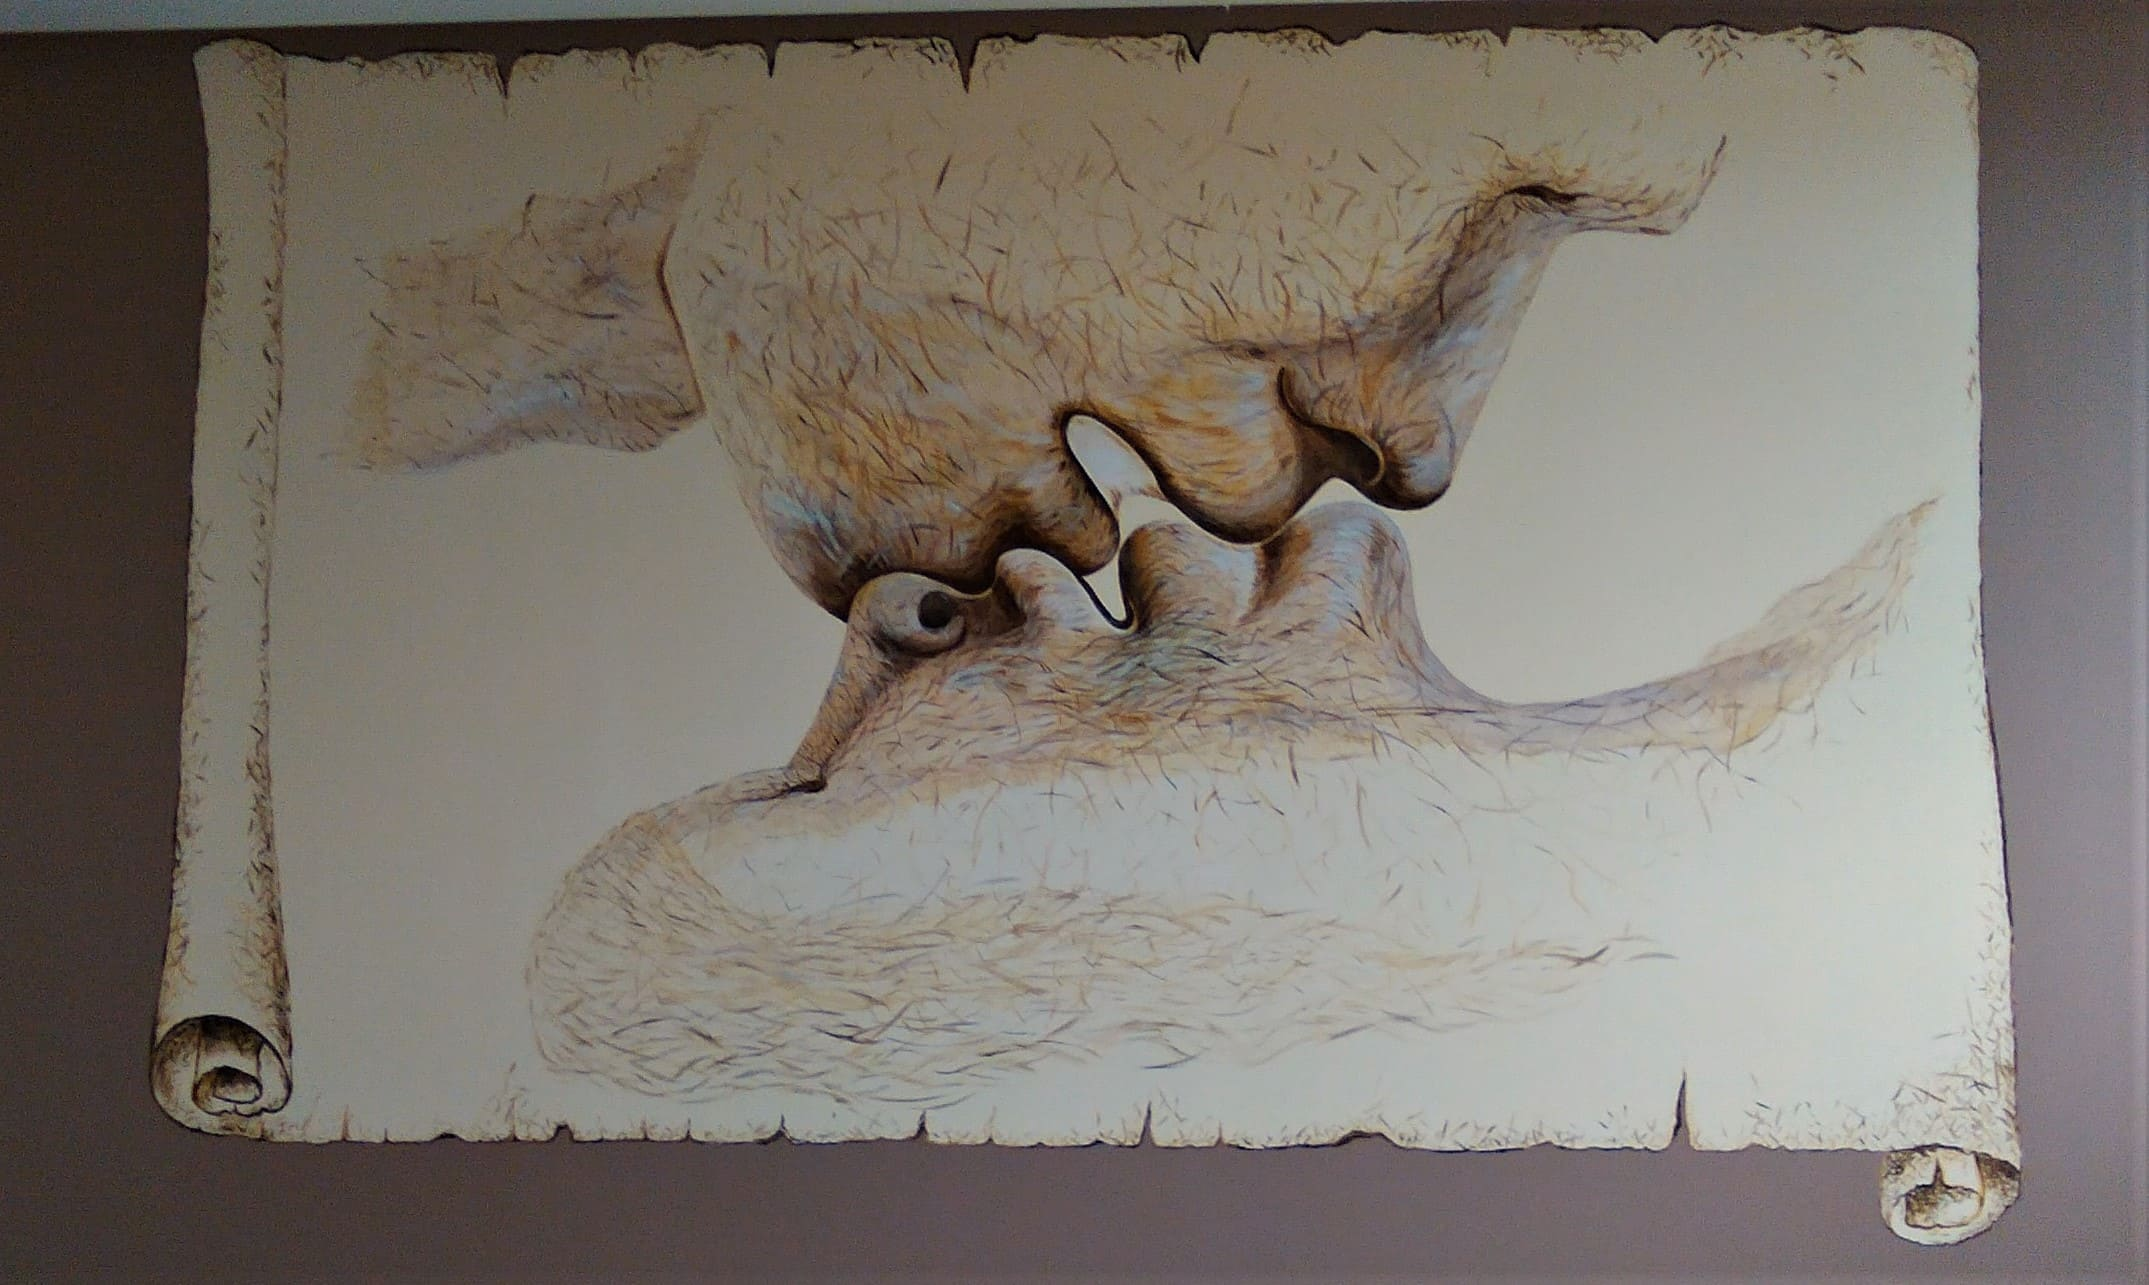 menine-kuryba-sienu-dekoravimas-ivairus-interjerai (28)